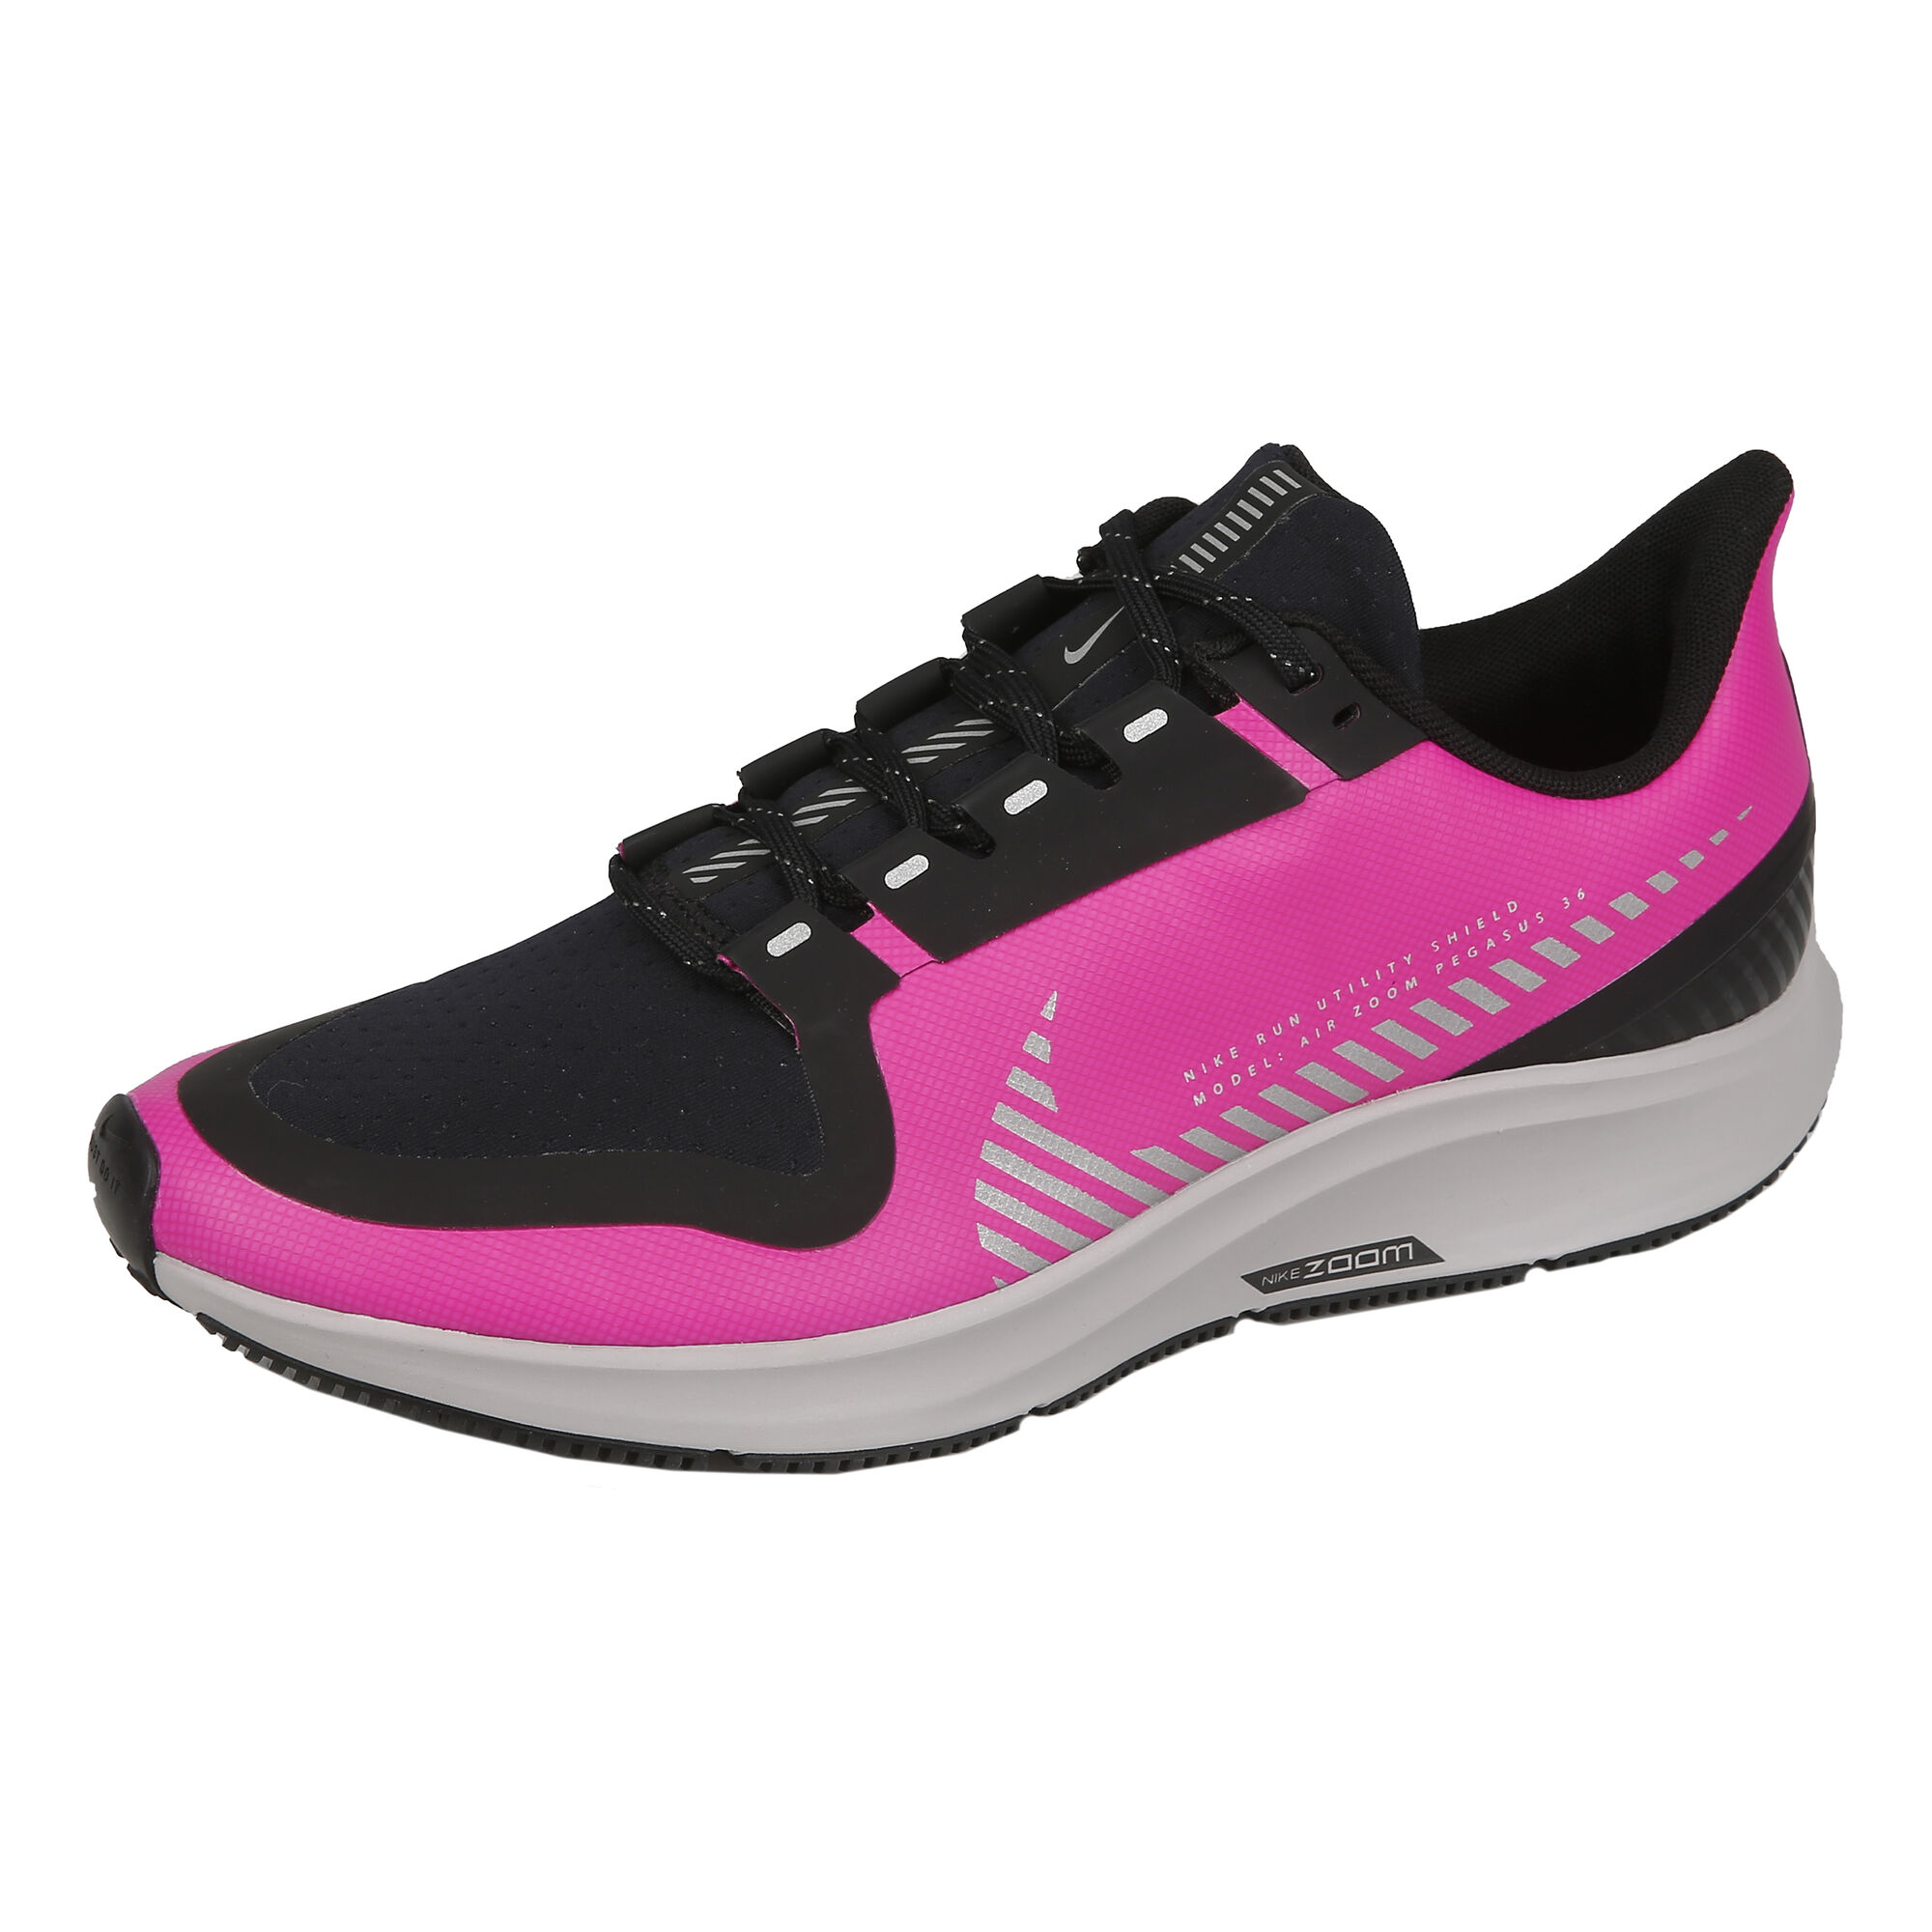 nudo Anzai Se asemeja  buy Nike Air Zoom Pegasus 36 Shield Neutral Running Shoe Women - Pink,  Black online | Jogging-Point